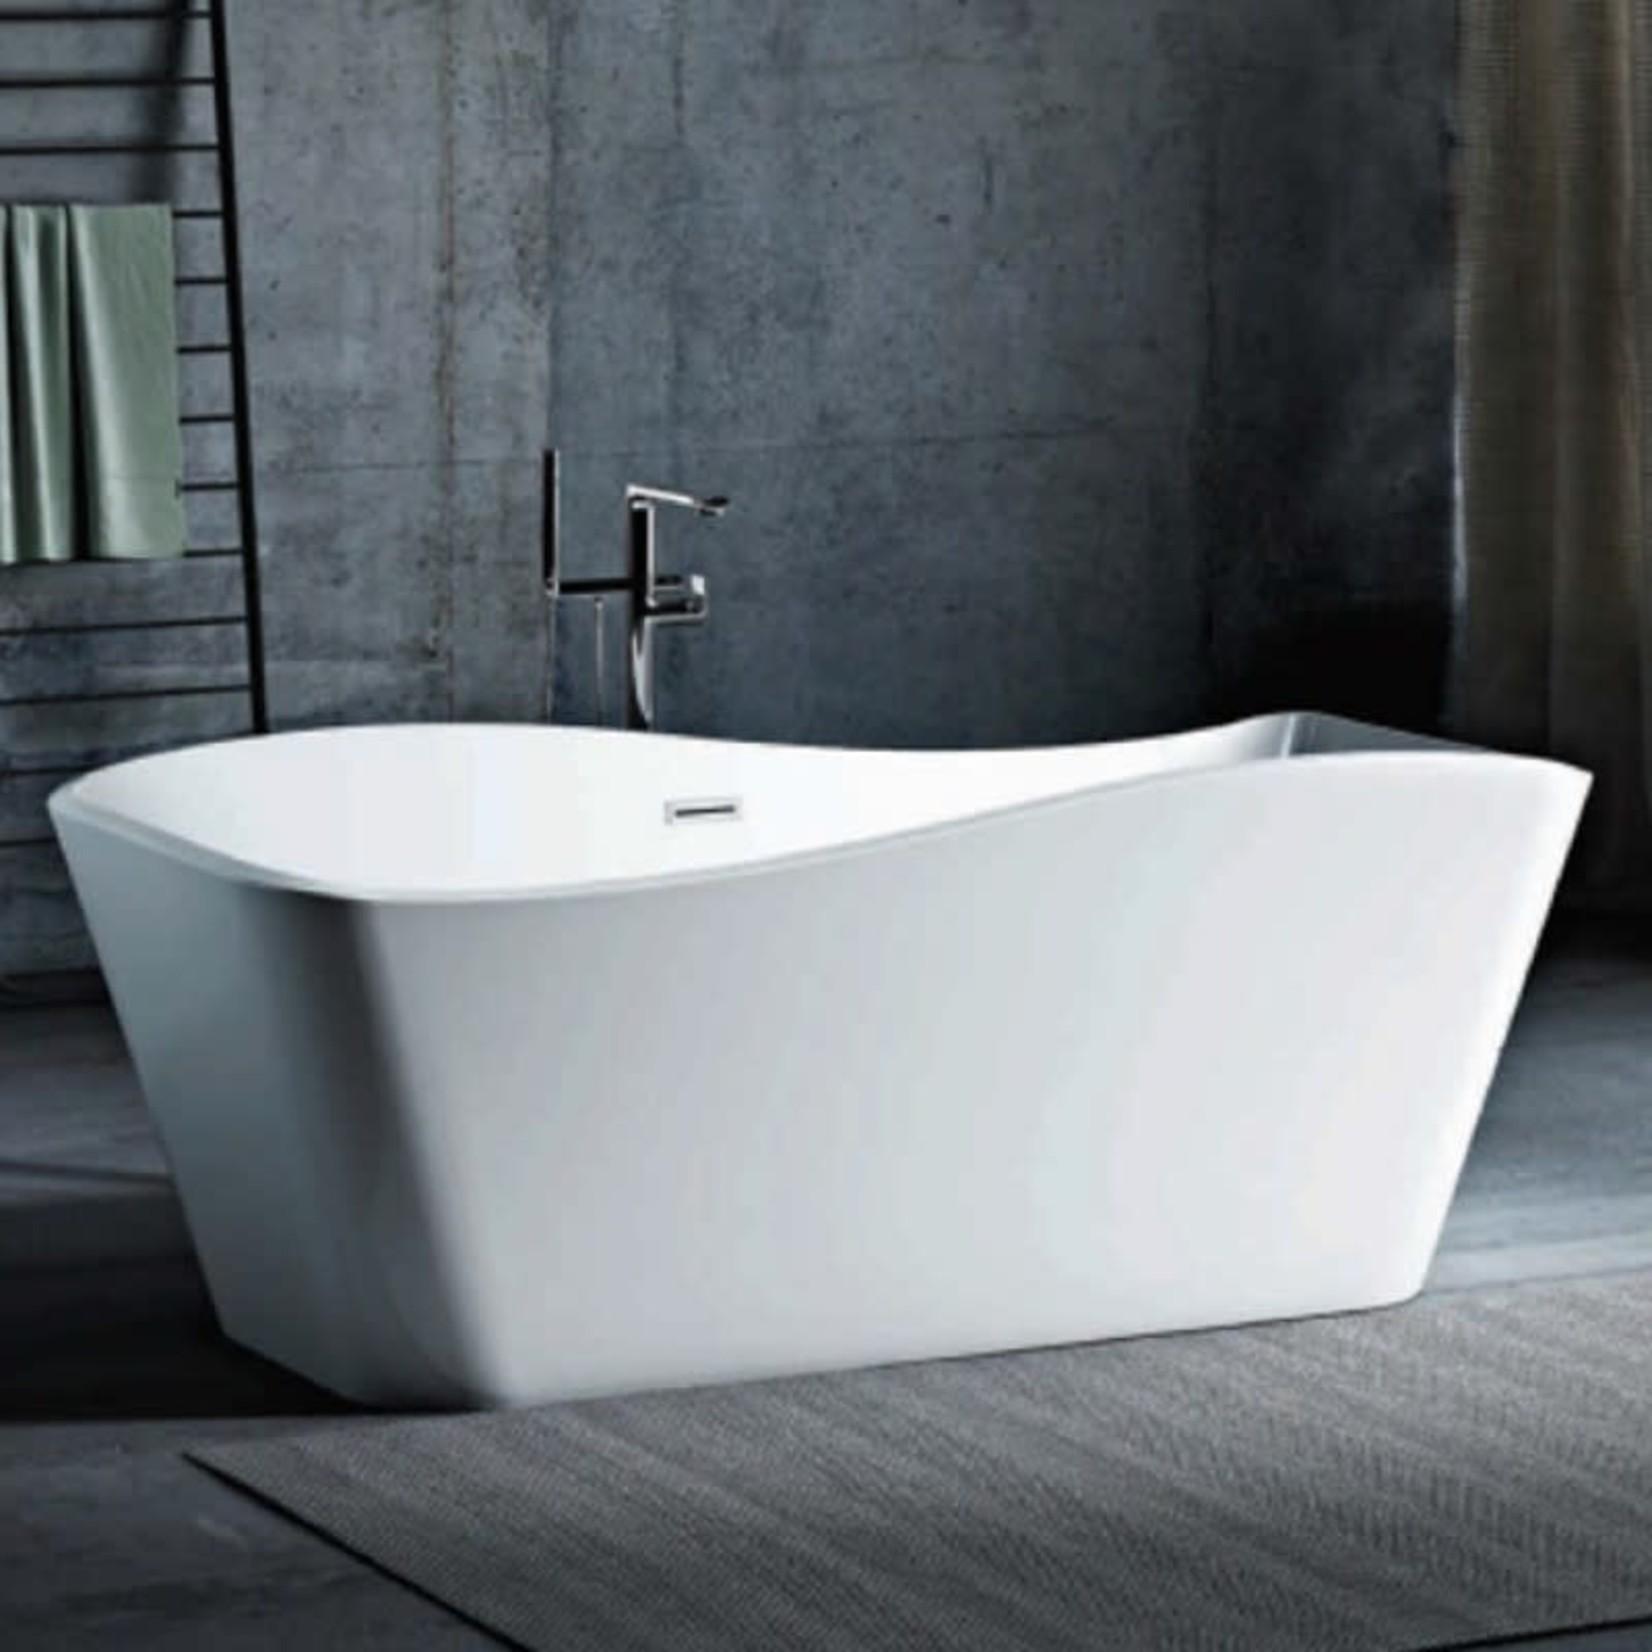 Eva Luxury Freestanding Bathtub 67 ''